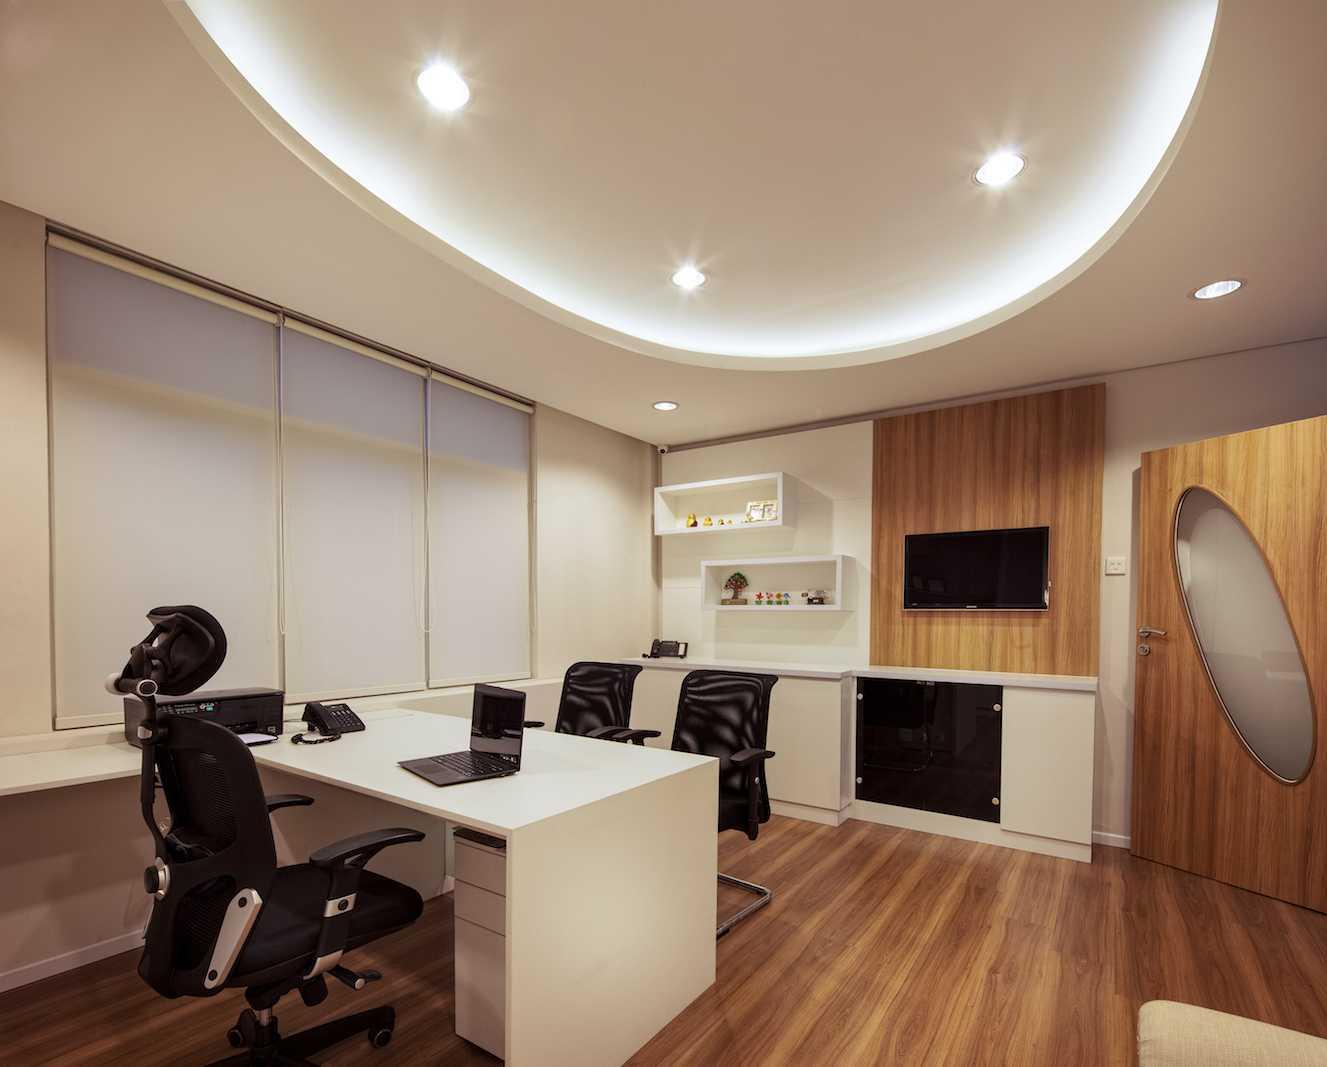 Pt Asa Adiguna G-Lenz Elang Laut Ruko - Pik Elang Laut Ruko - Pik Office Room Minimalis 24534